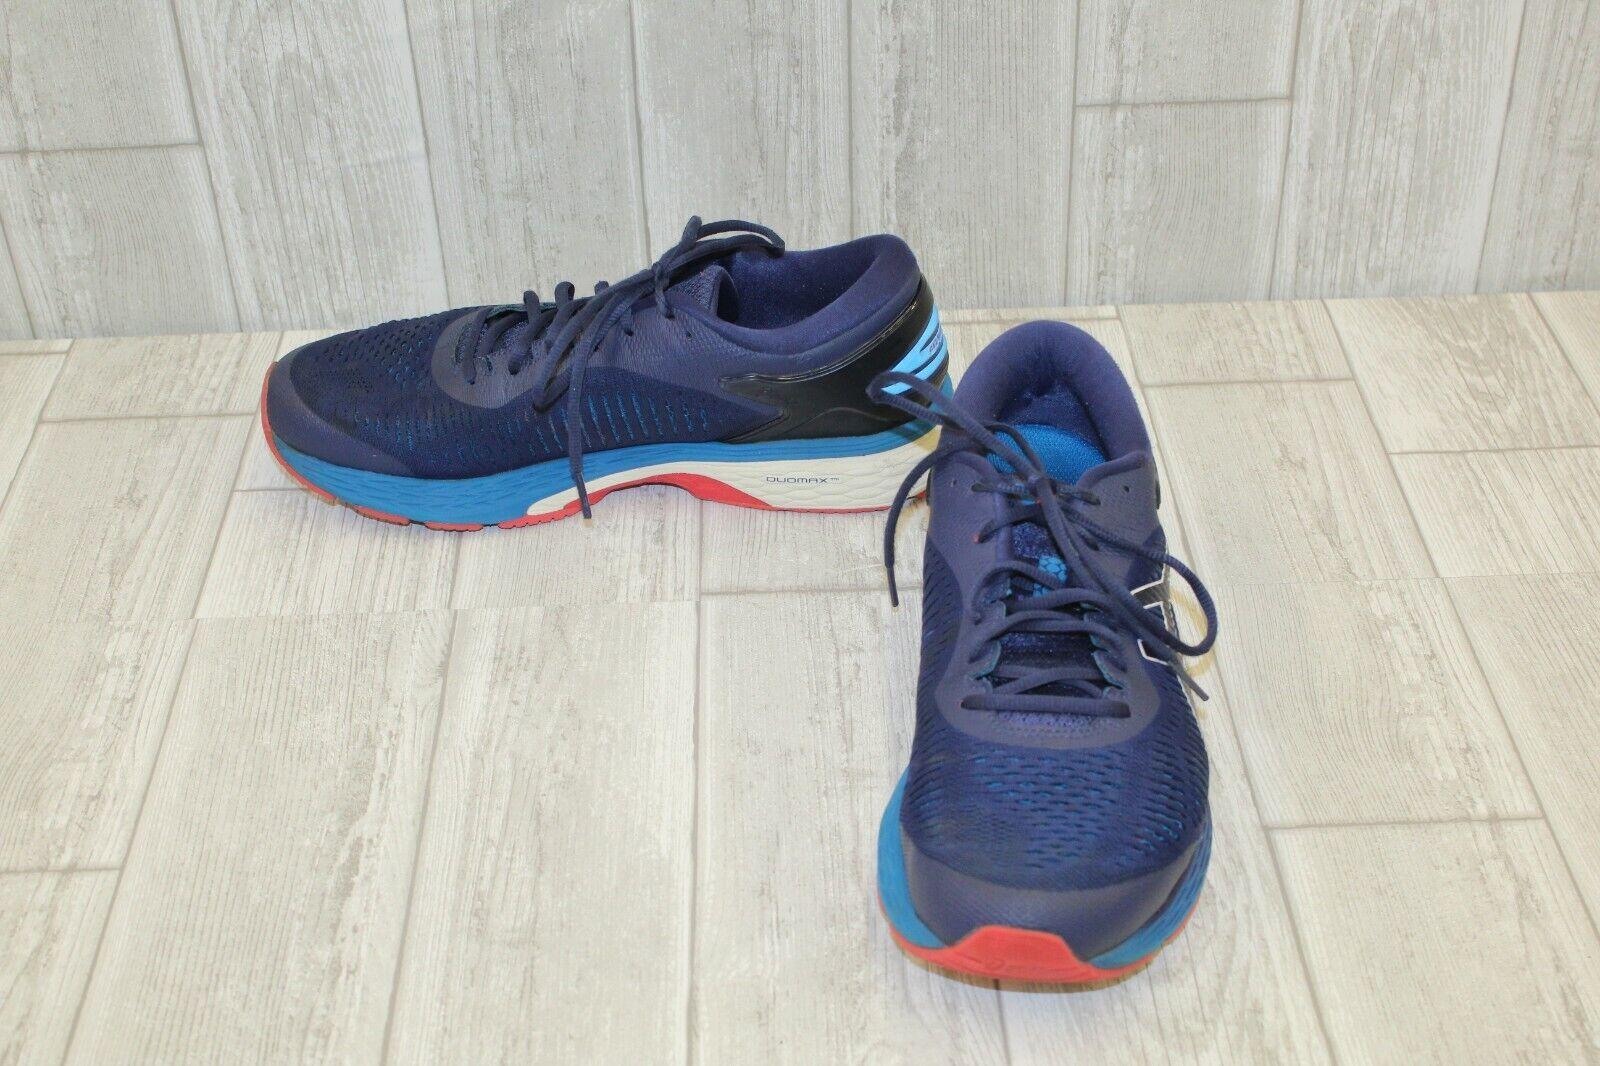 Asics Kayano 25 Athletic shoes - Men's Size 10.5 - Navy